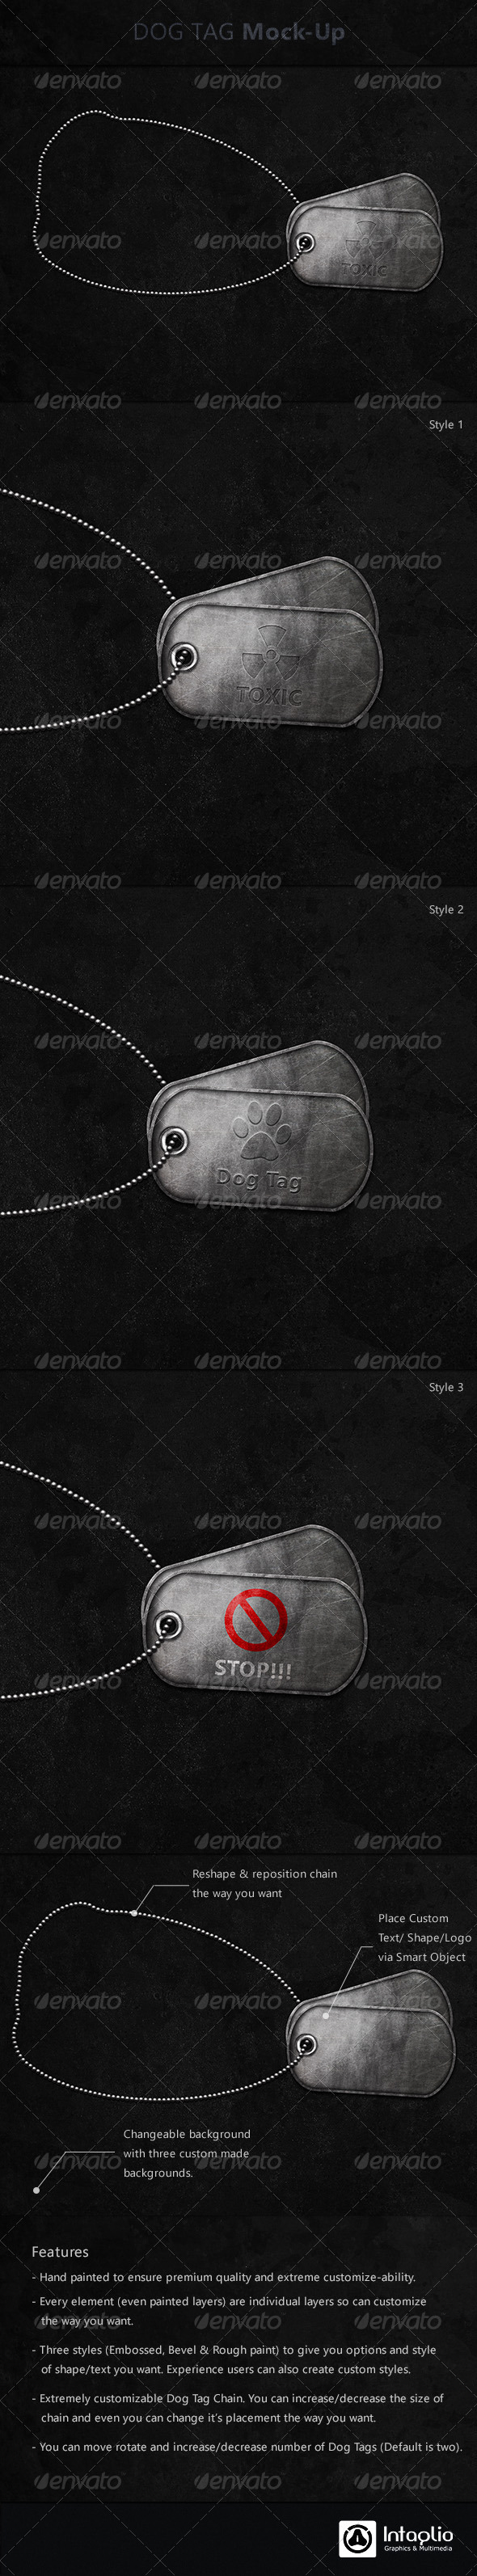 GraphicRiver Dog Tag Mock-Up 2918147